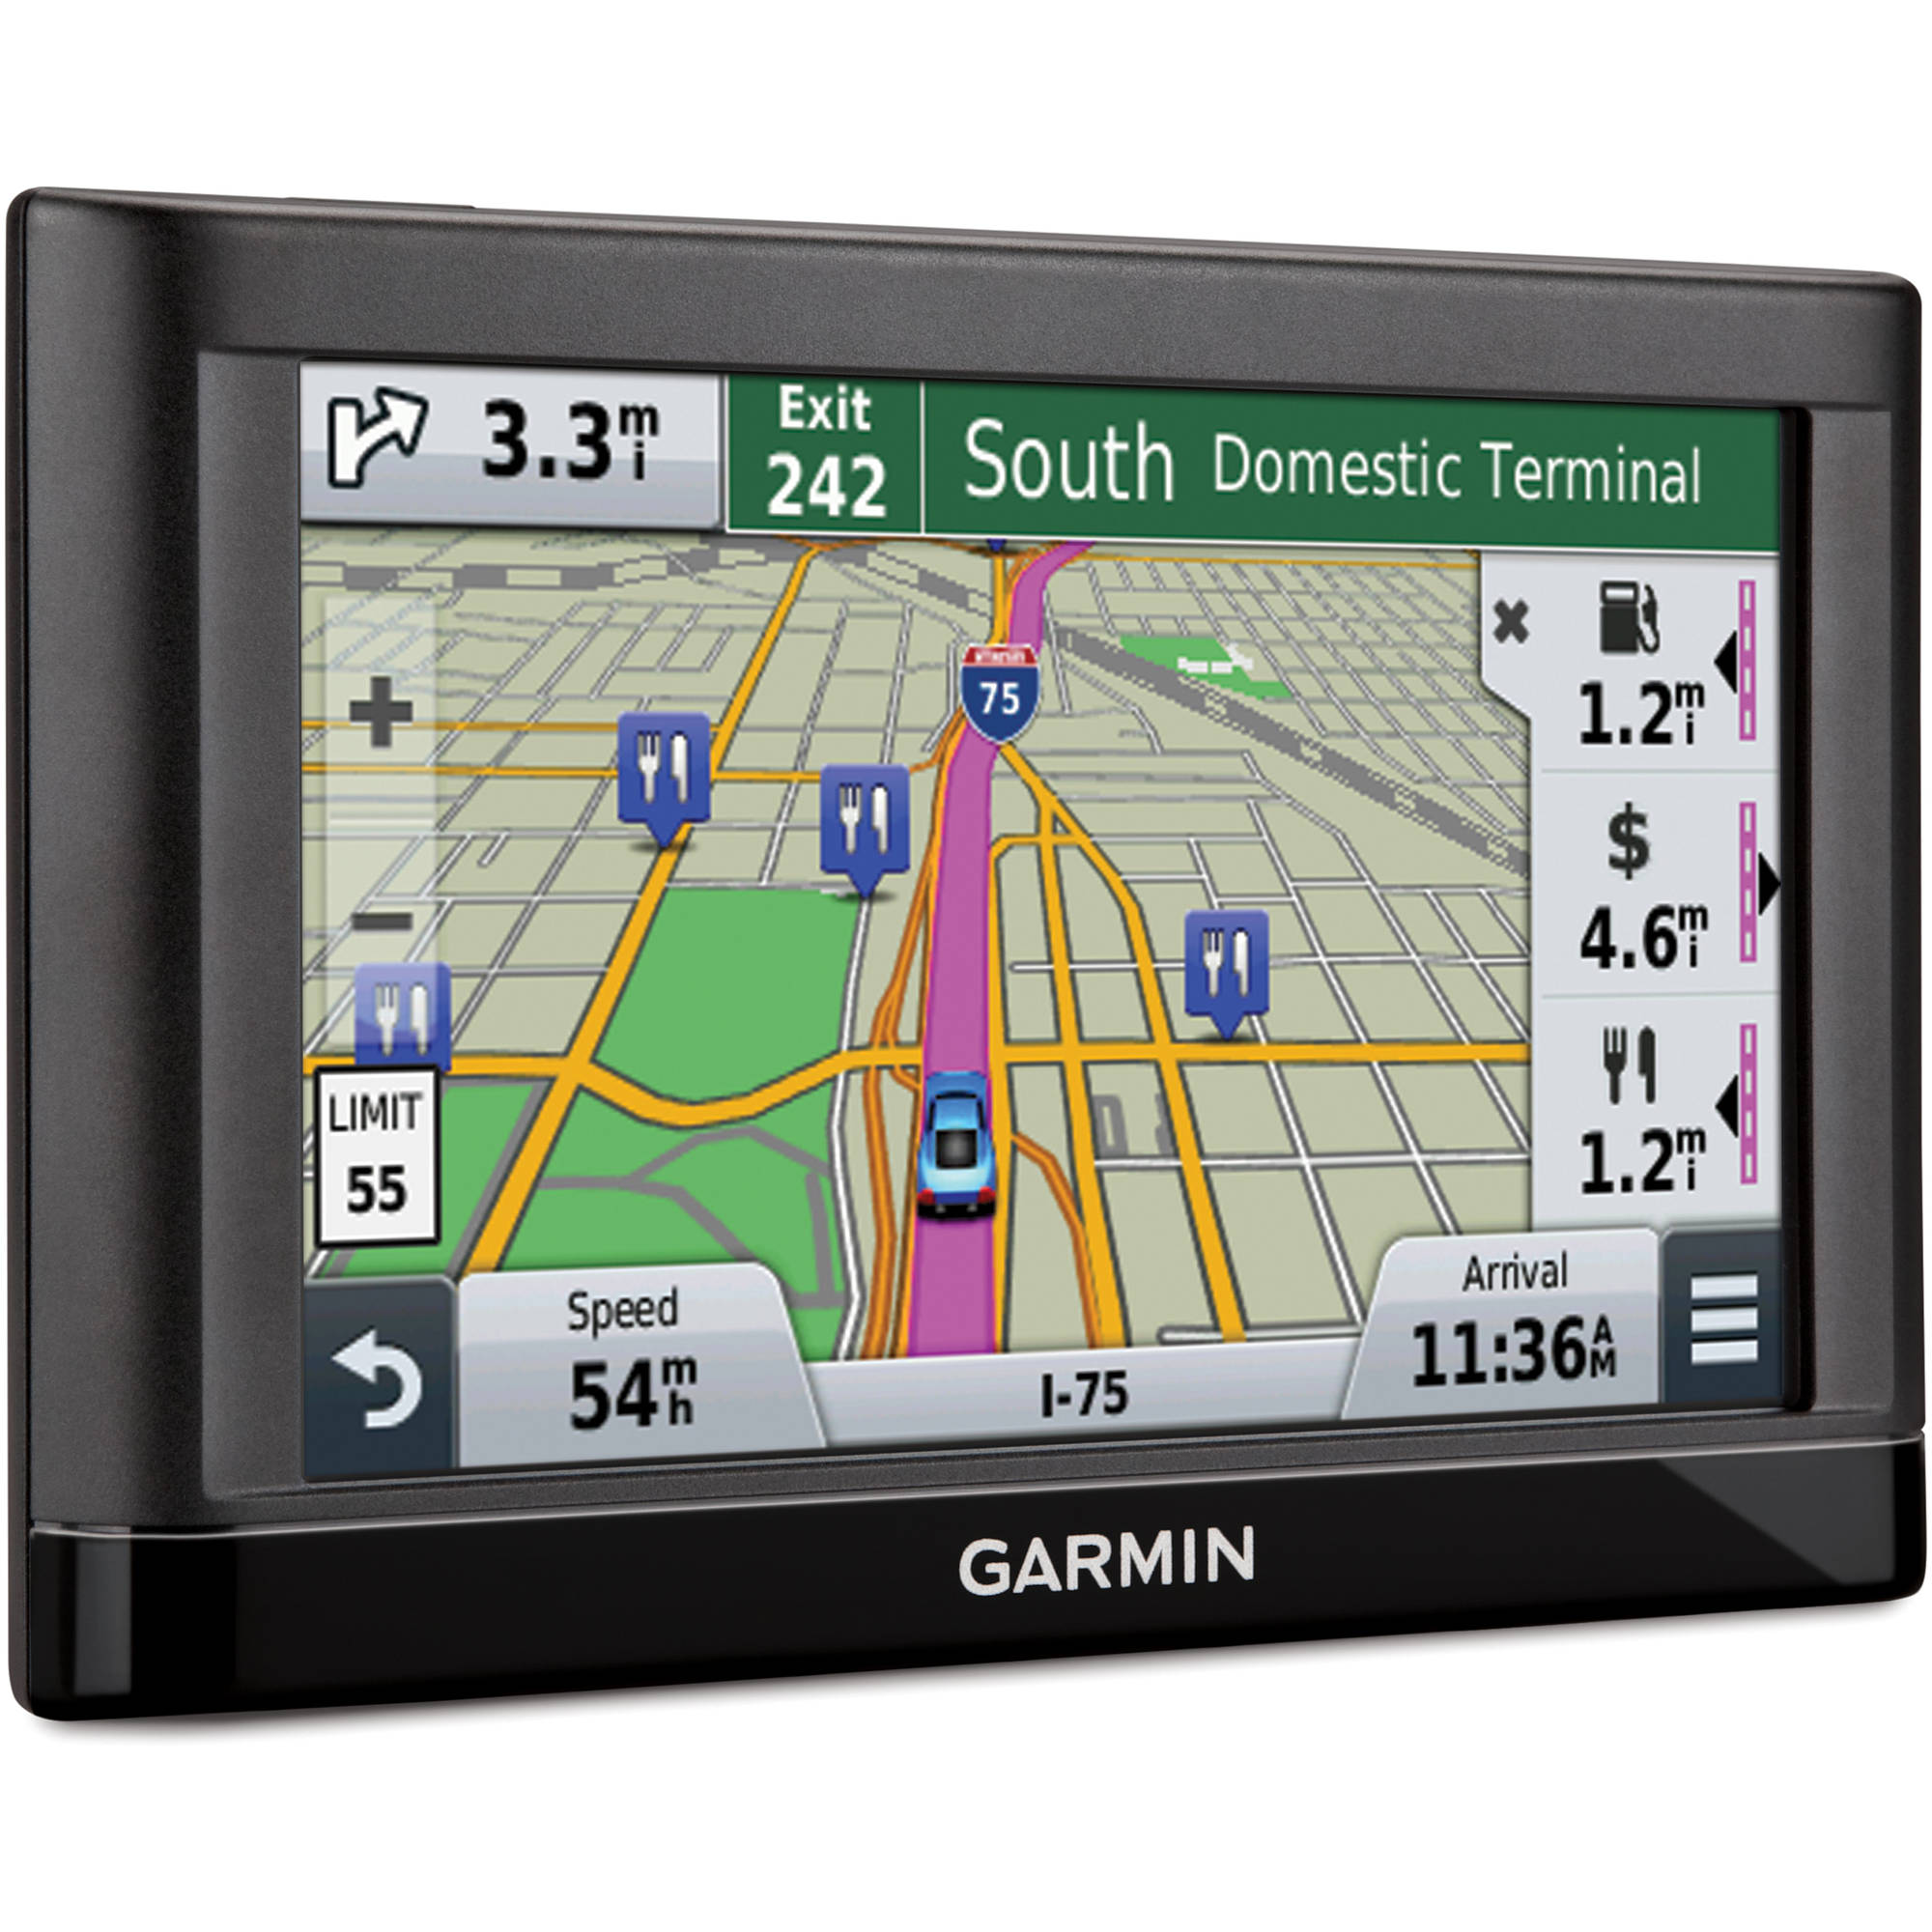 Garmin Nuvi 56LM GPS With US/Canada Maps Maps